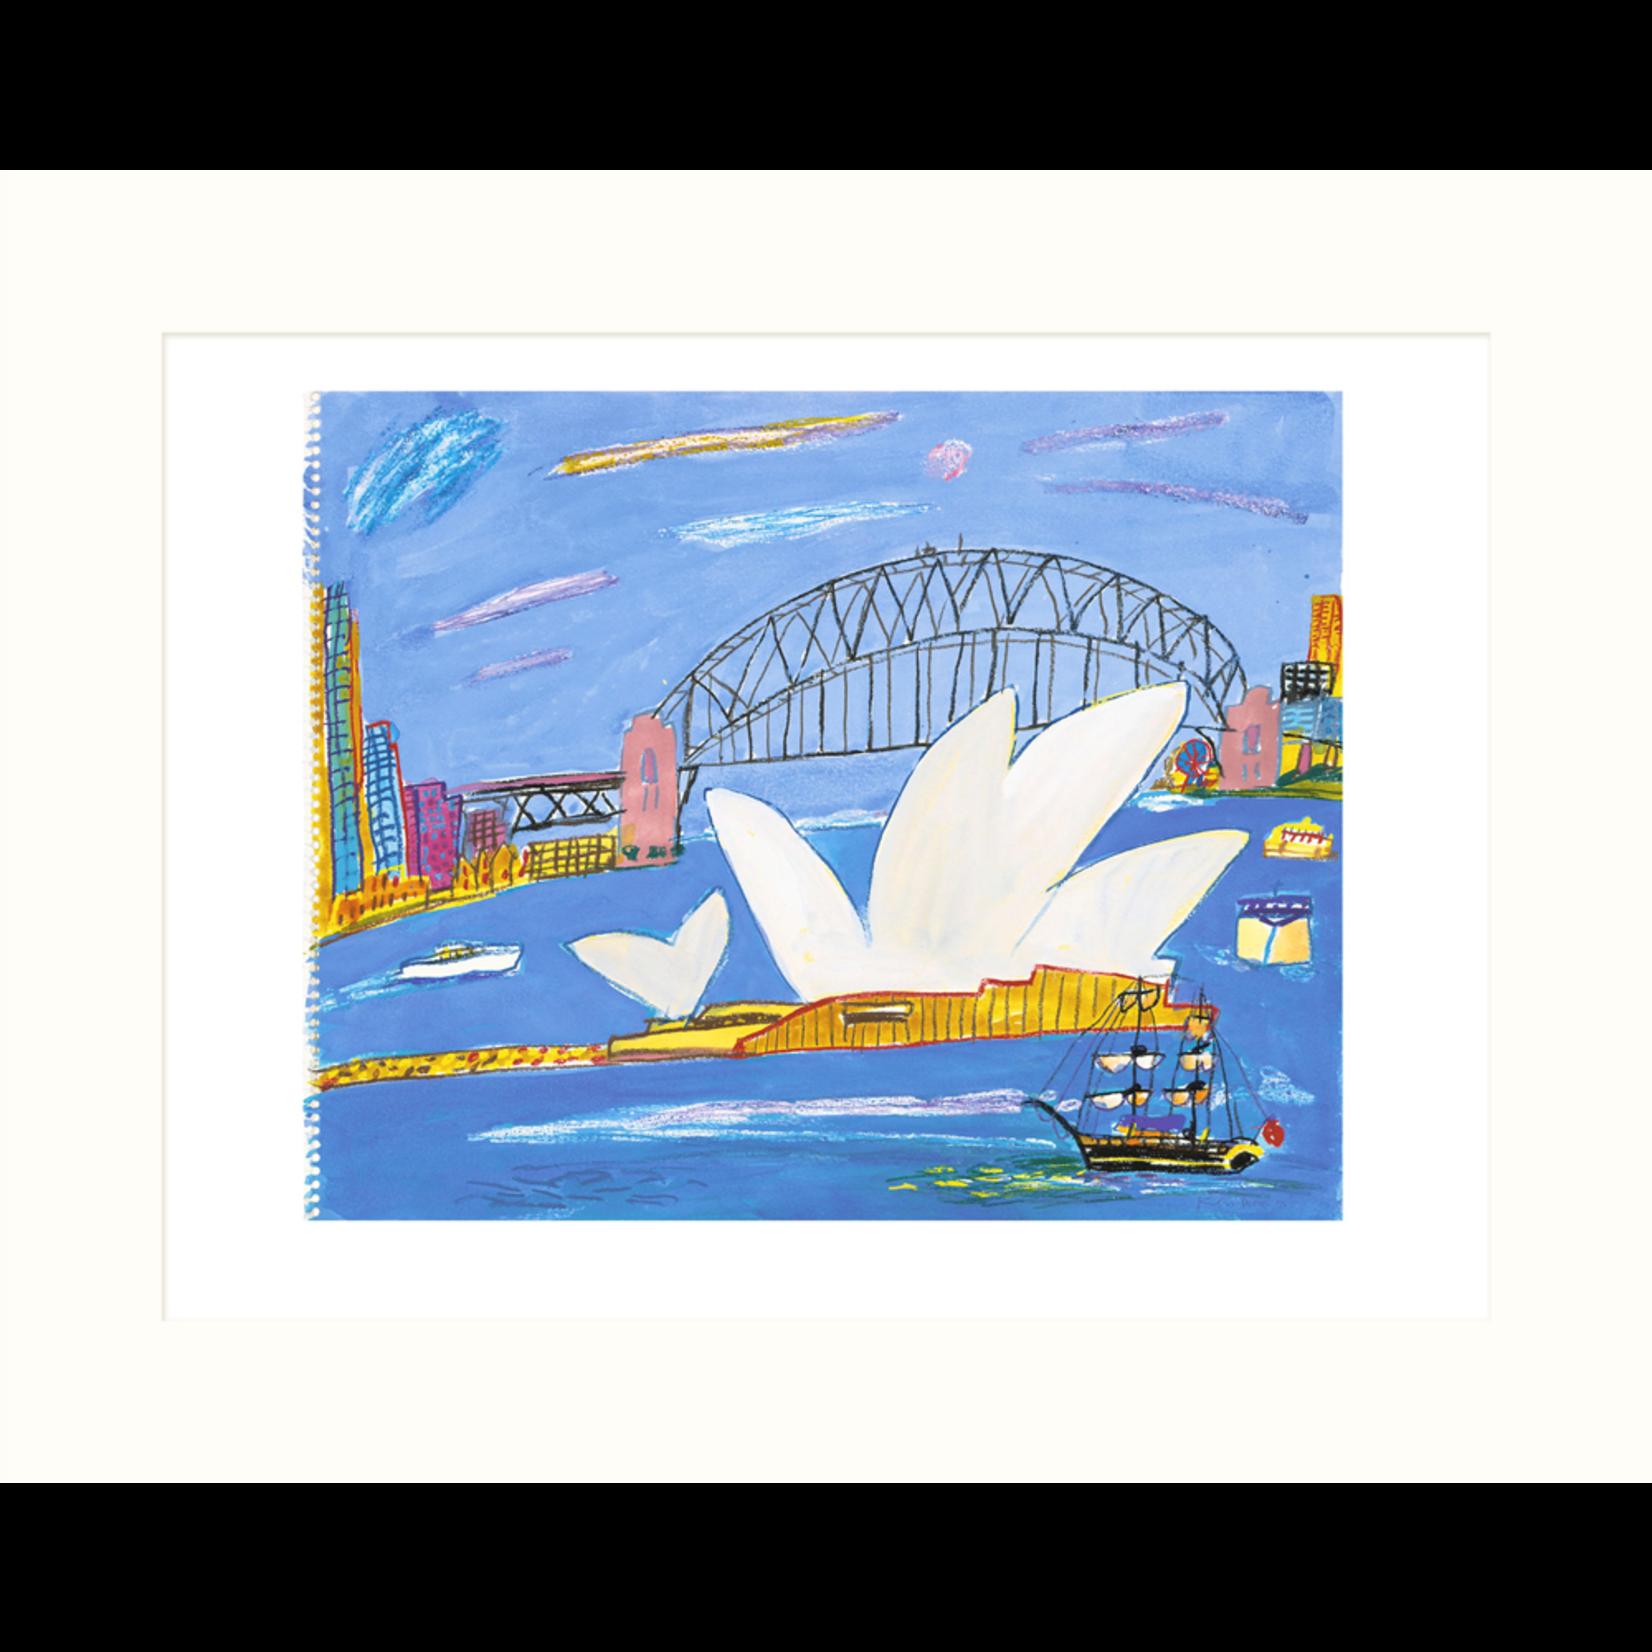 Limited Edition Prints Bridge and Opera House, sailing ship, 1995